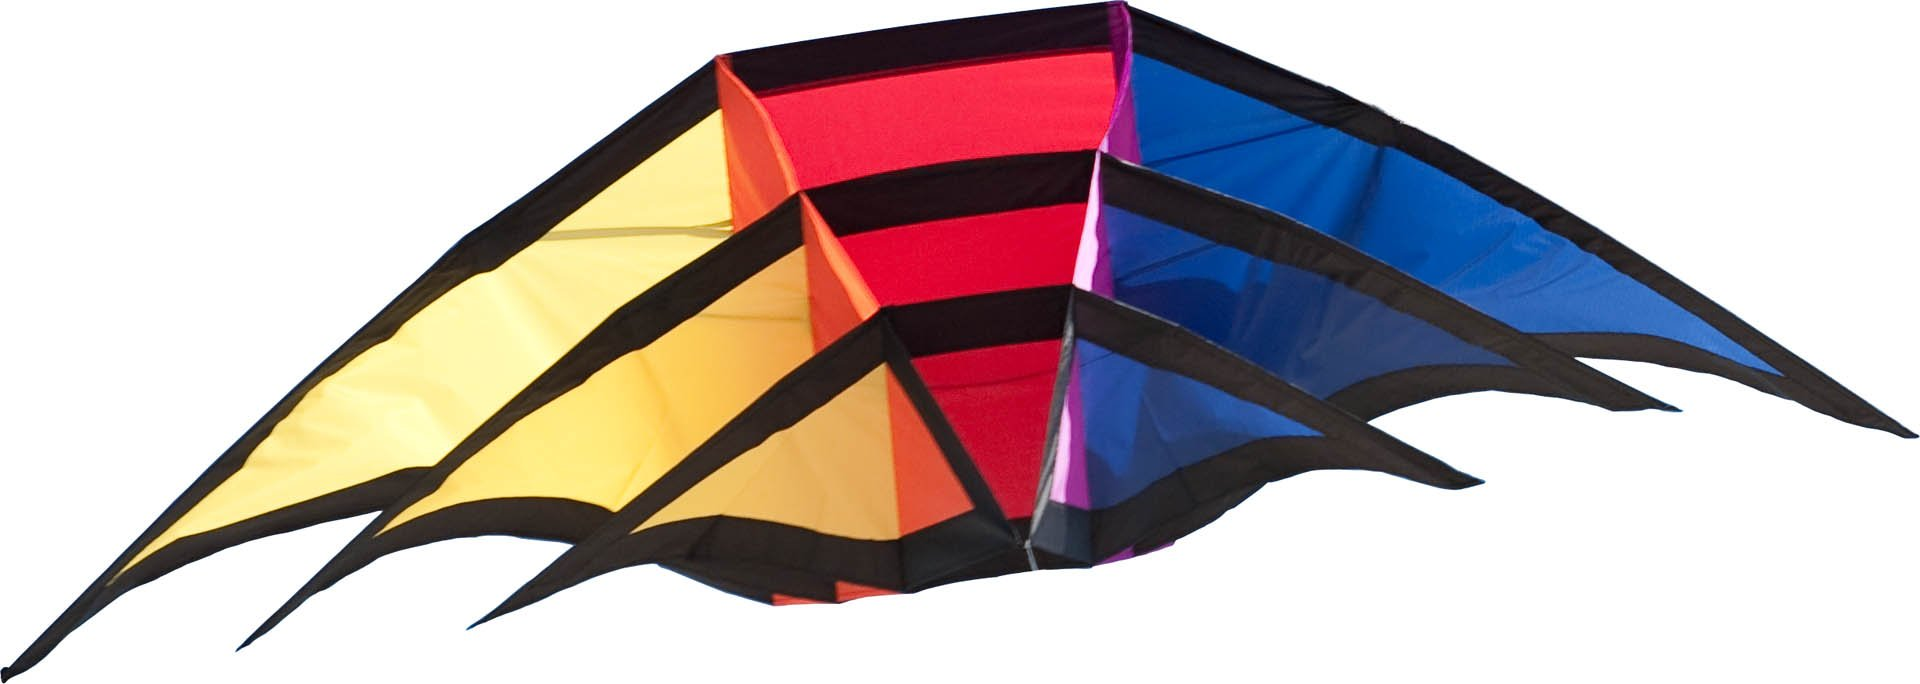 HQ Kites Giant Triangulation Kite by HQ Kites and Design (Image #1)